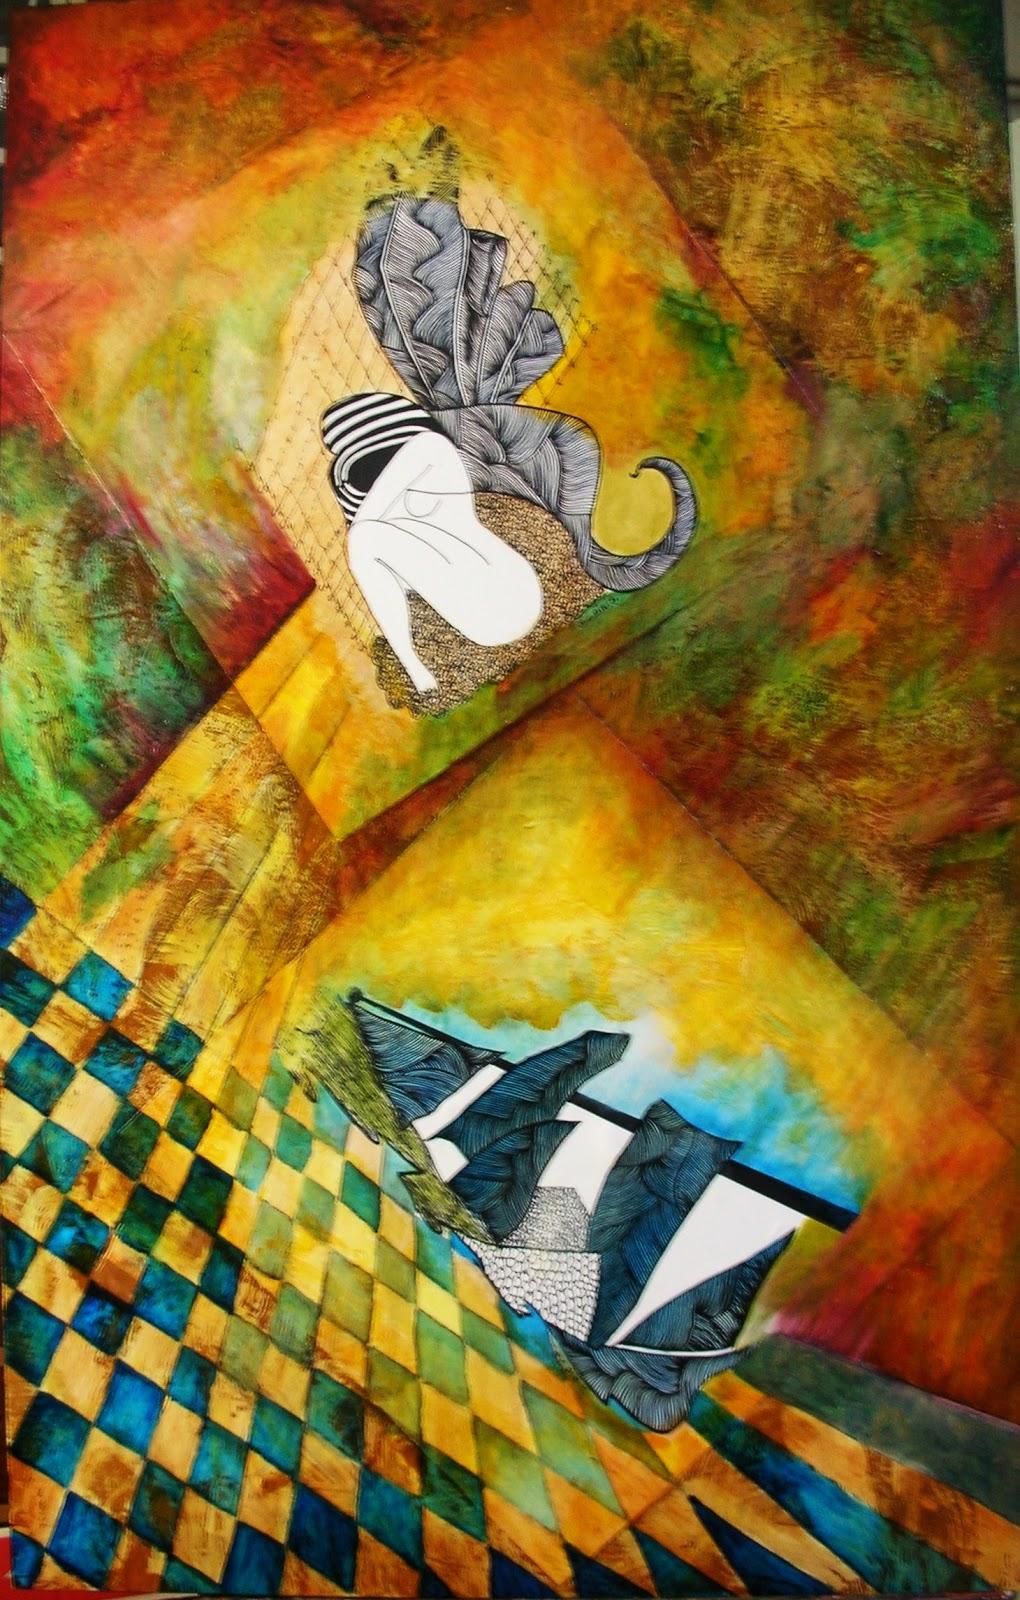 Cuadro de la artista Josefina Cabrera Piris